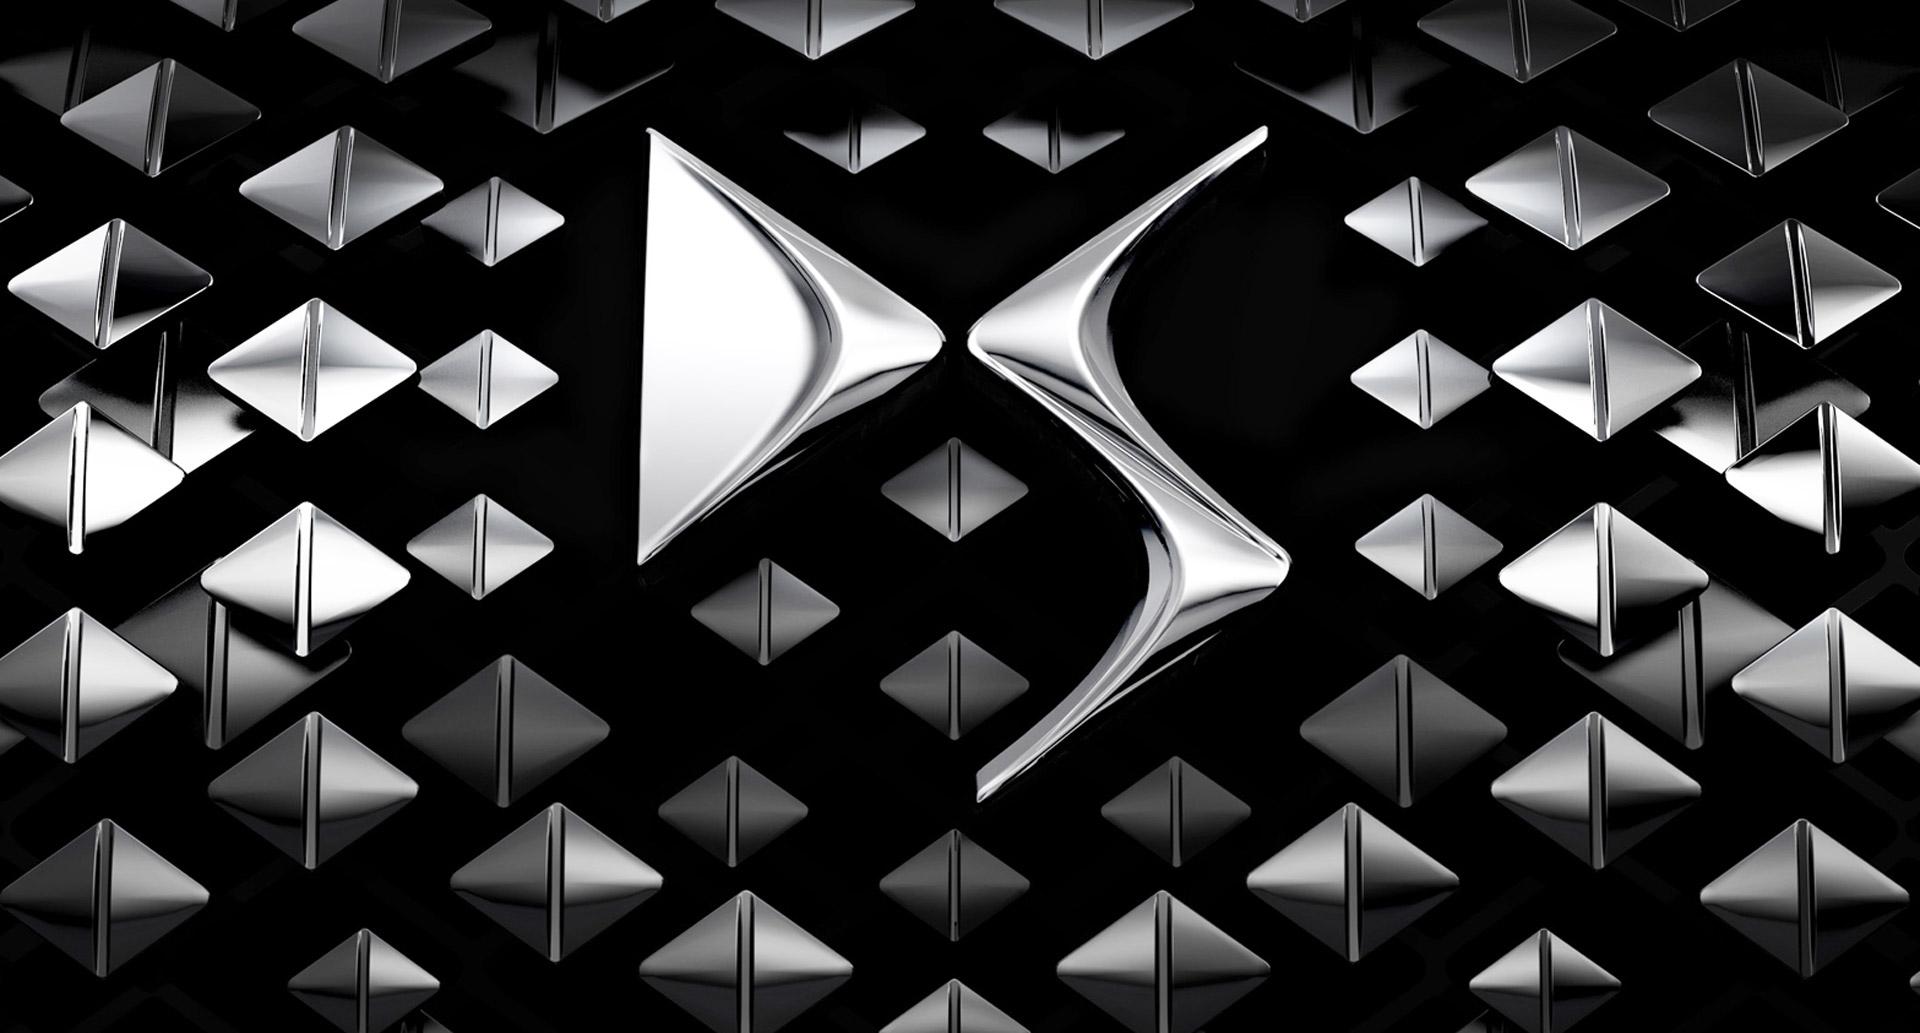 PSA Peugeot Citroën's Fledgling DS Brand Gets DS Performance Motorsport Division